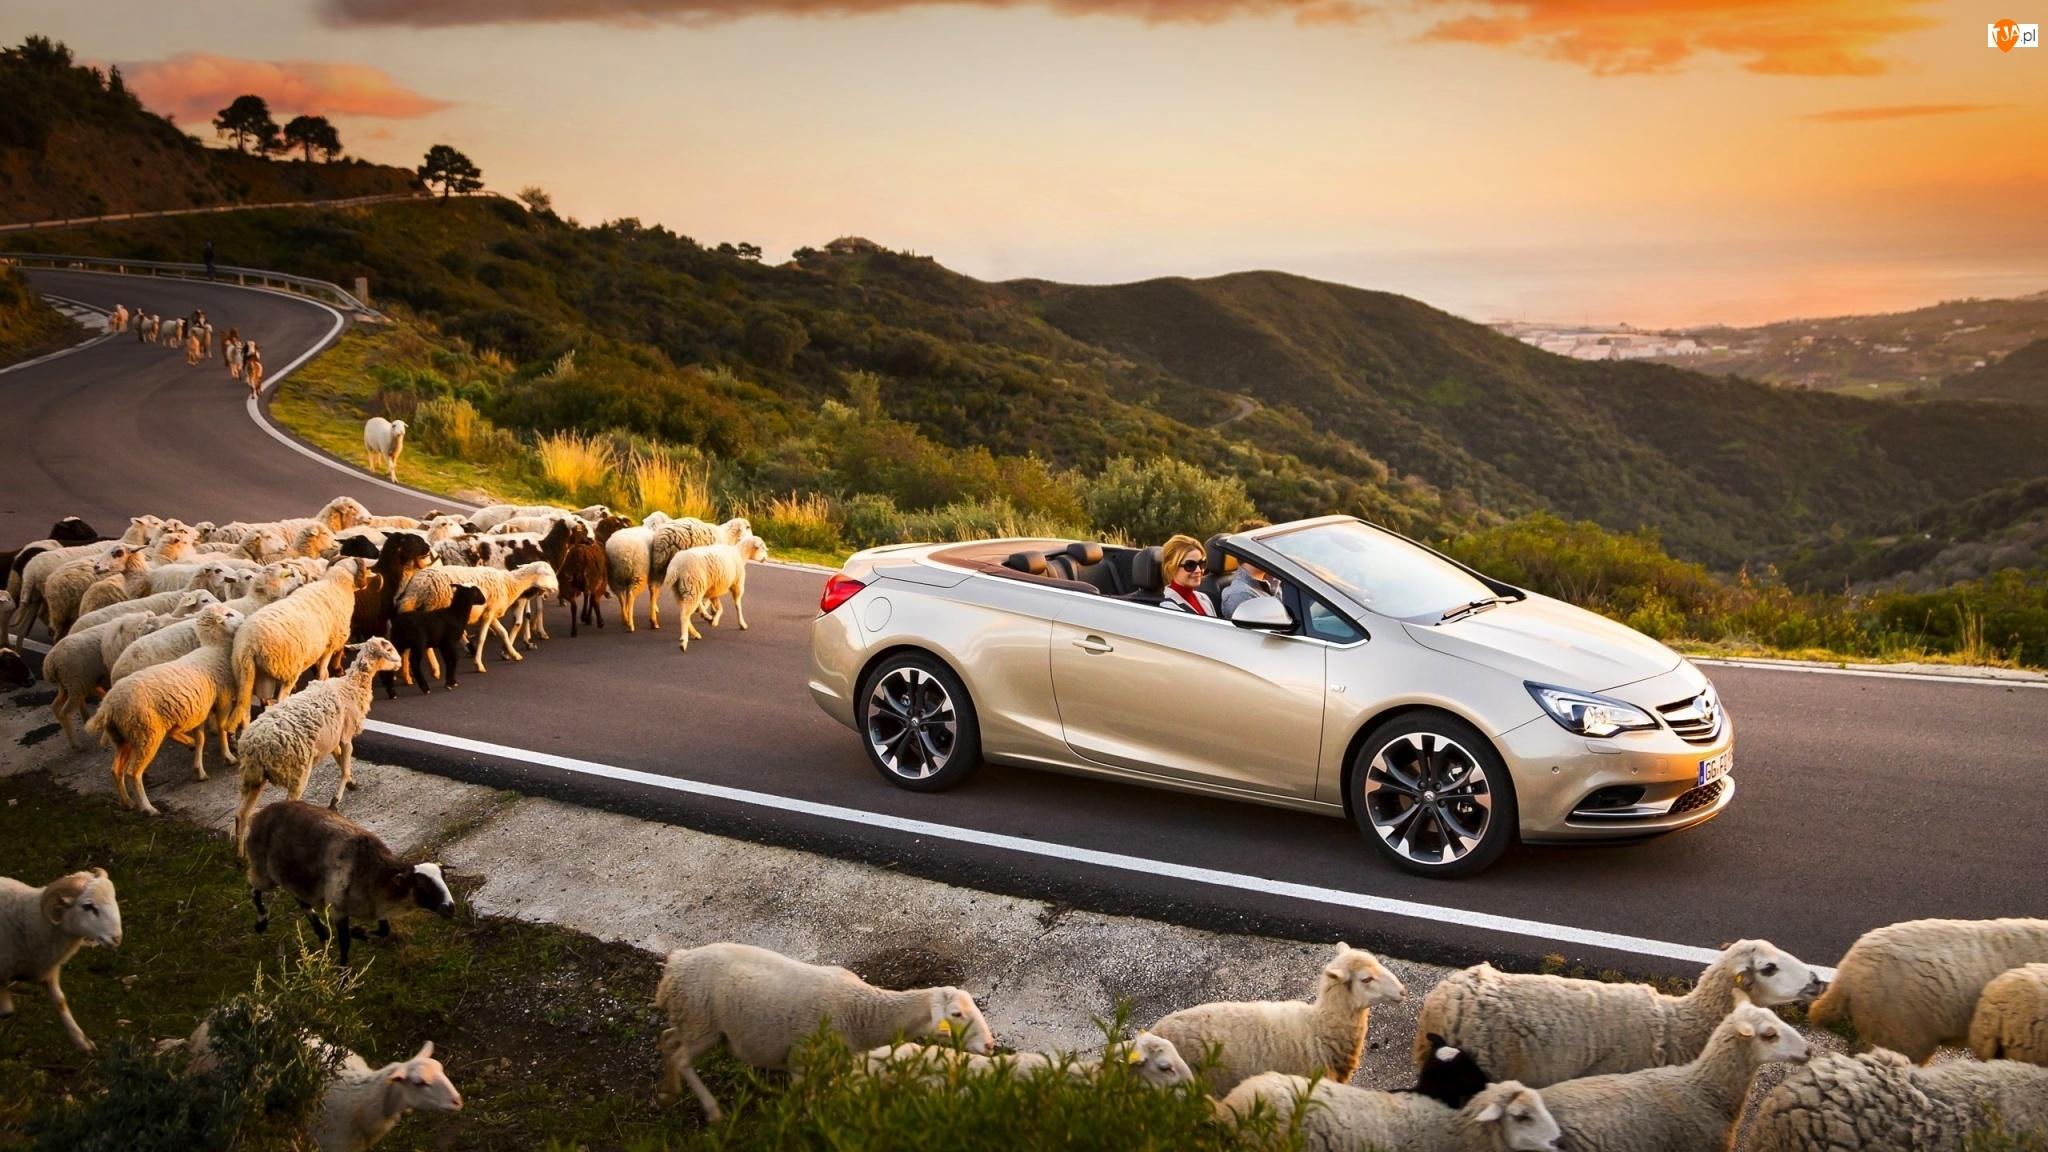 Owce, Góry, Opel, Zachód, Samochód, Słońca, Cascada, Droga